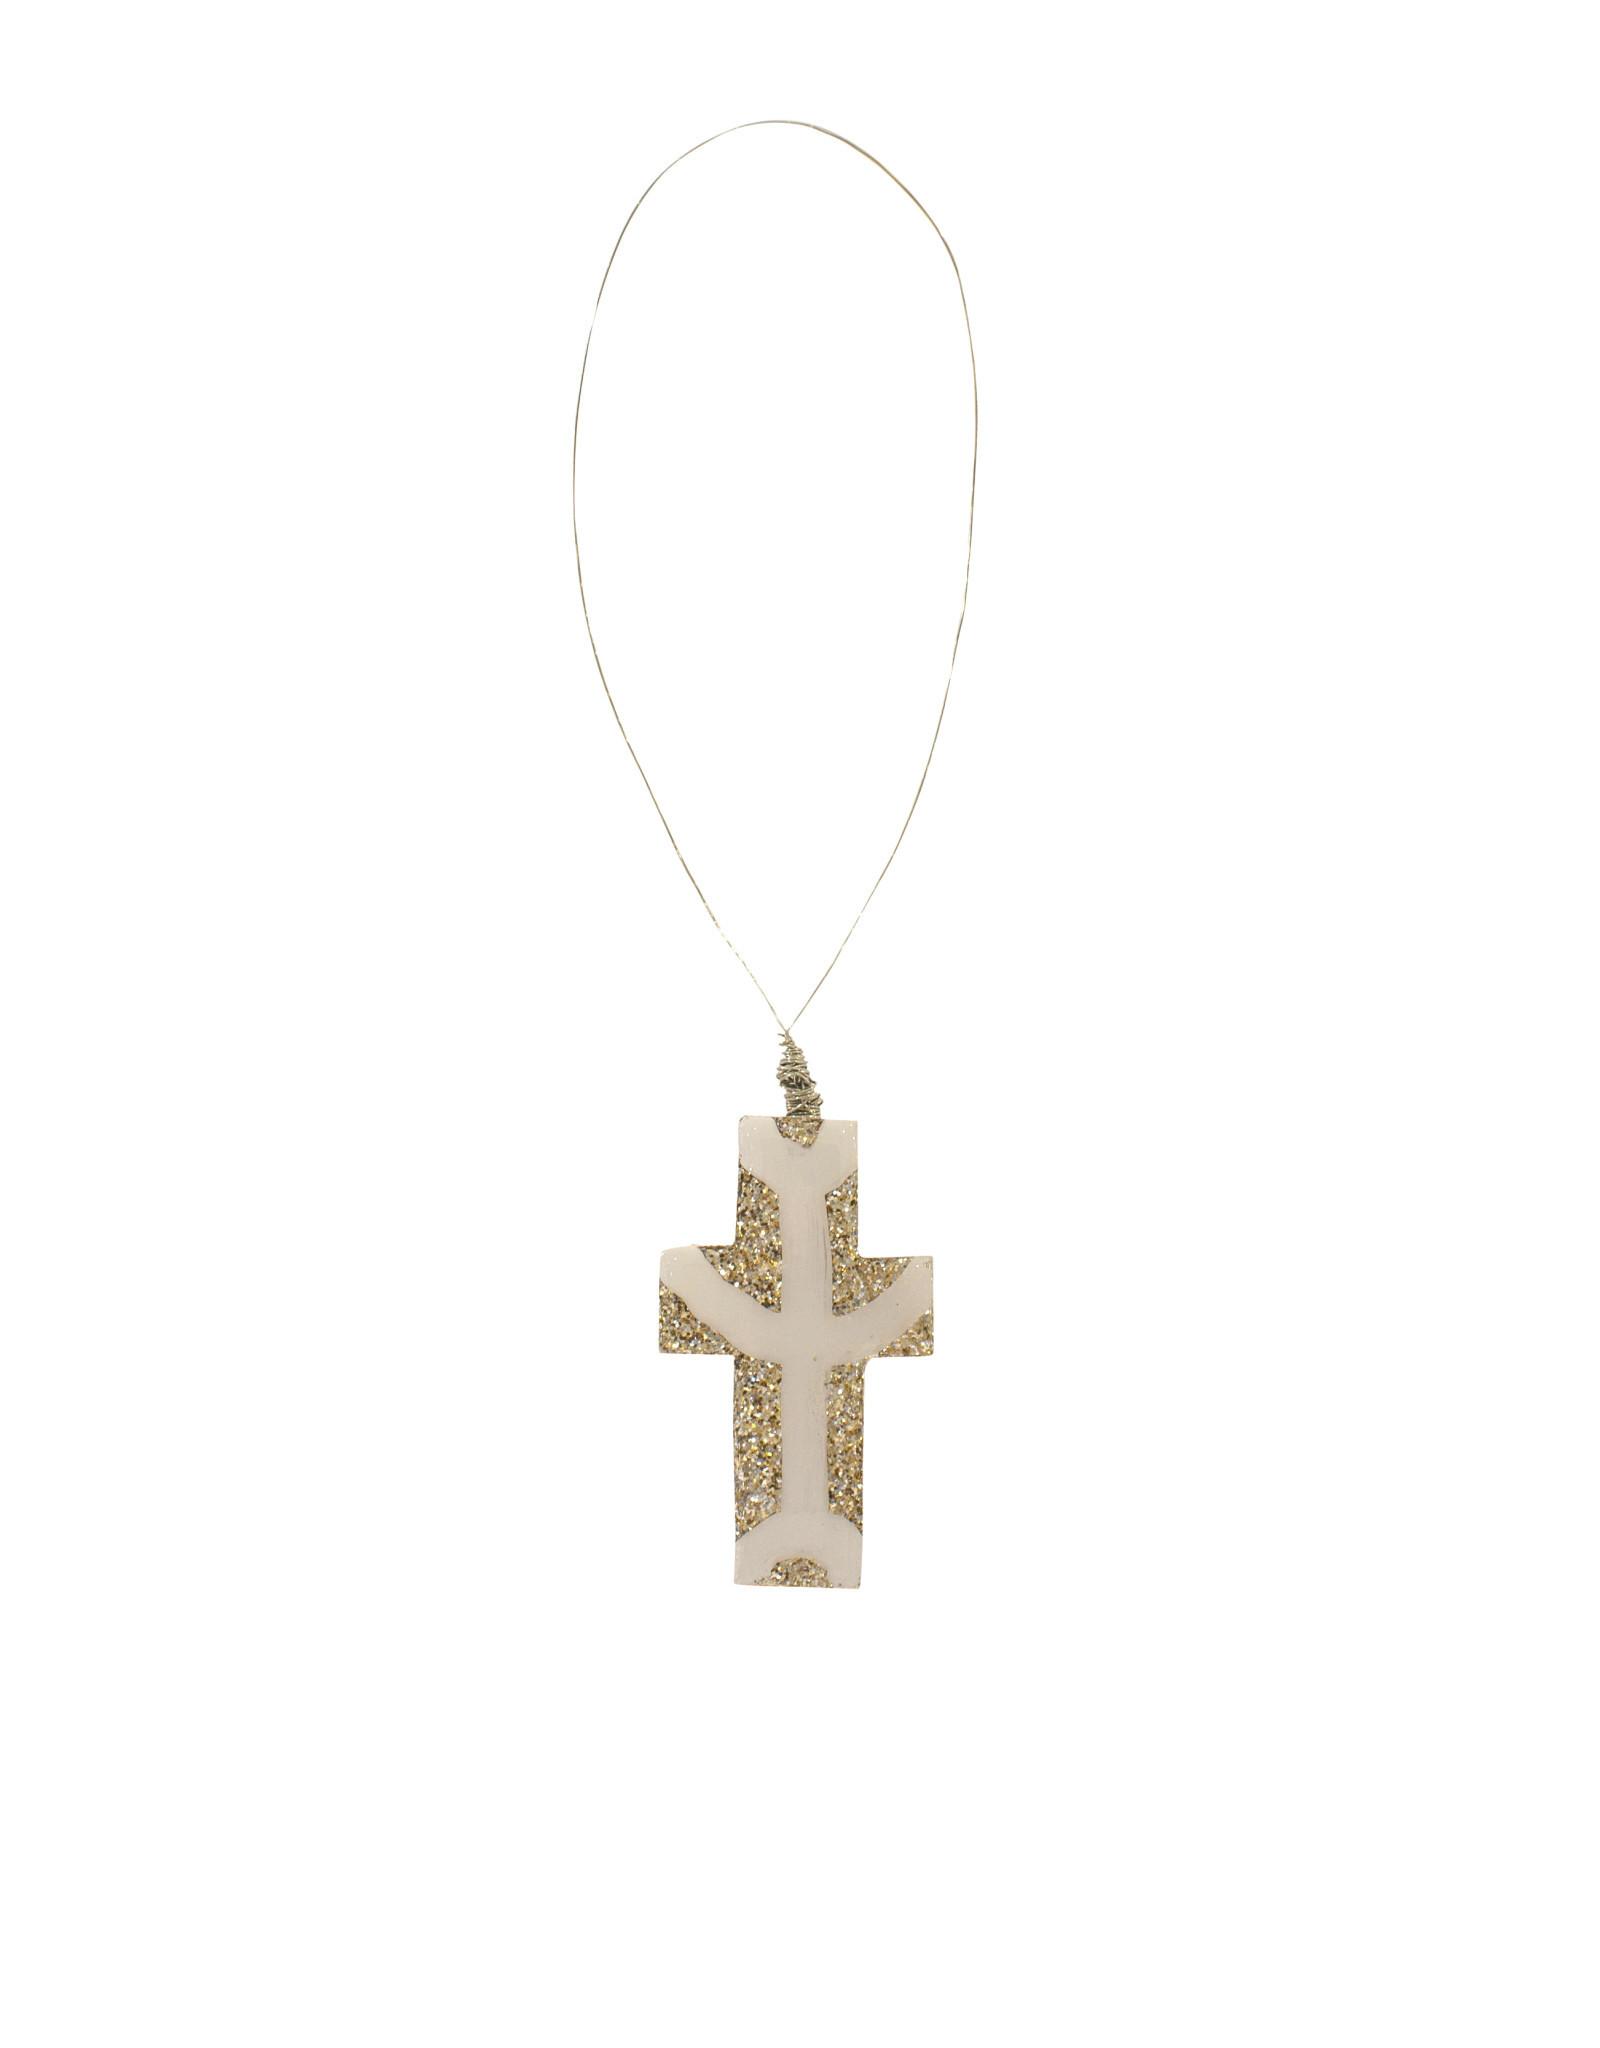 Entouquet Champagne Glitter + Line Design Small Cross on Wire